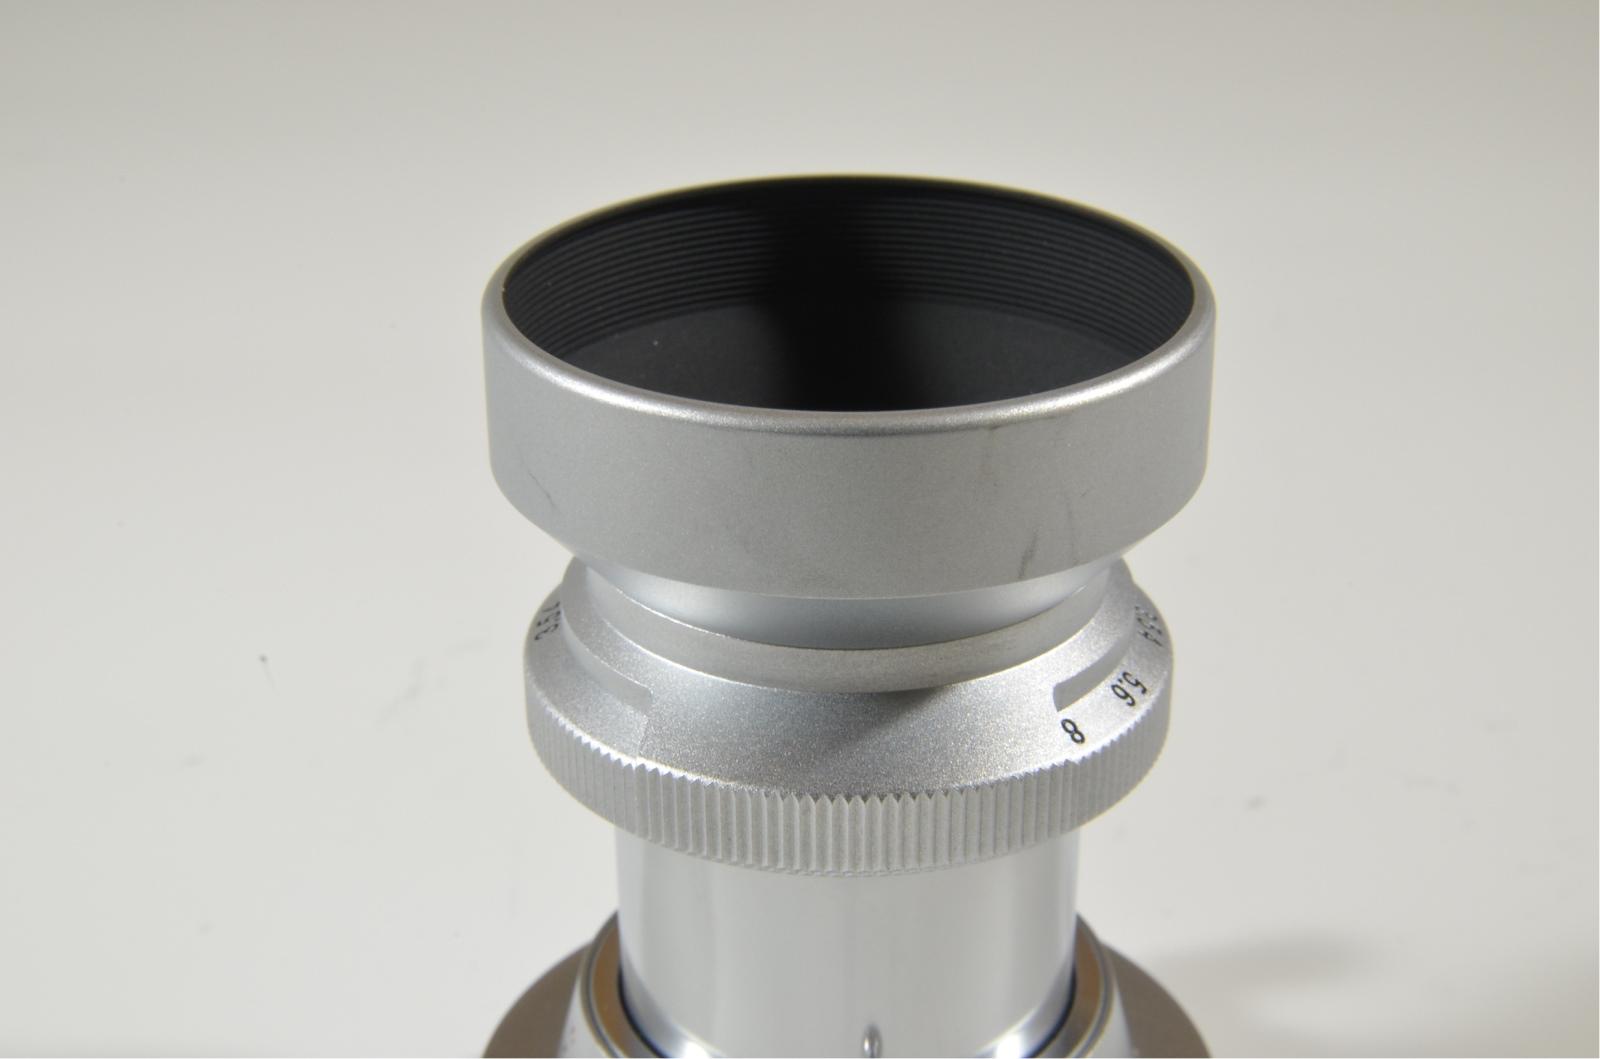 voigtlander bessa-t heliar 50mm f/3.5 101 years limited